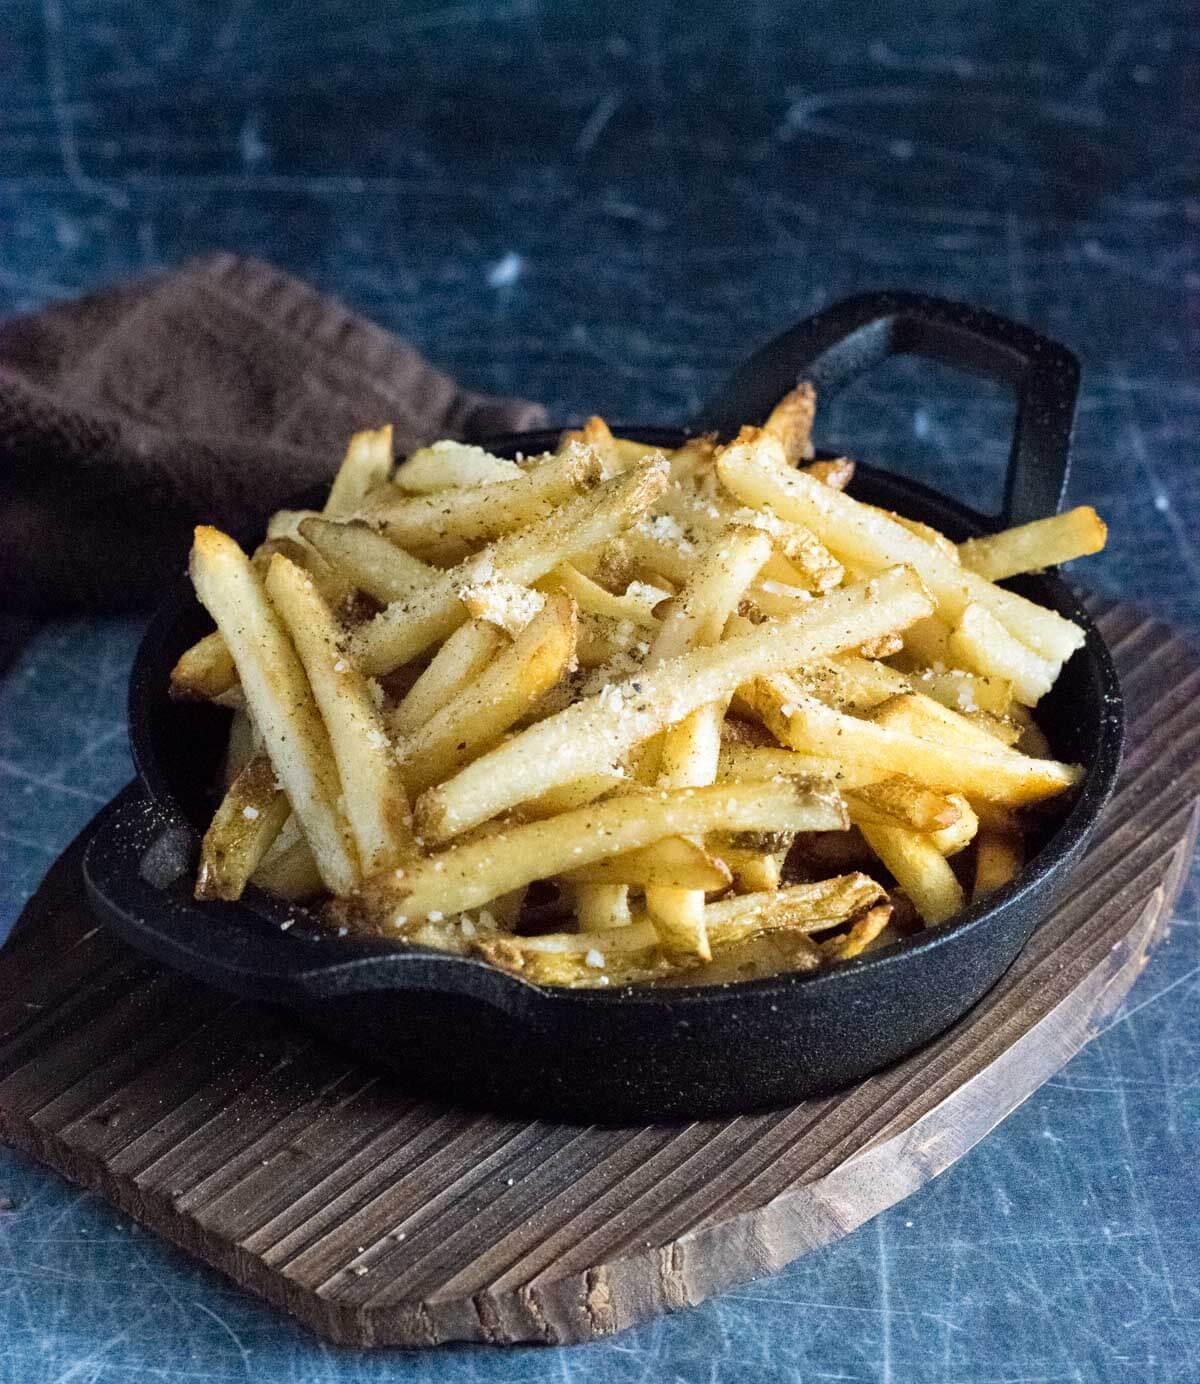 Truffle fries in dish.